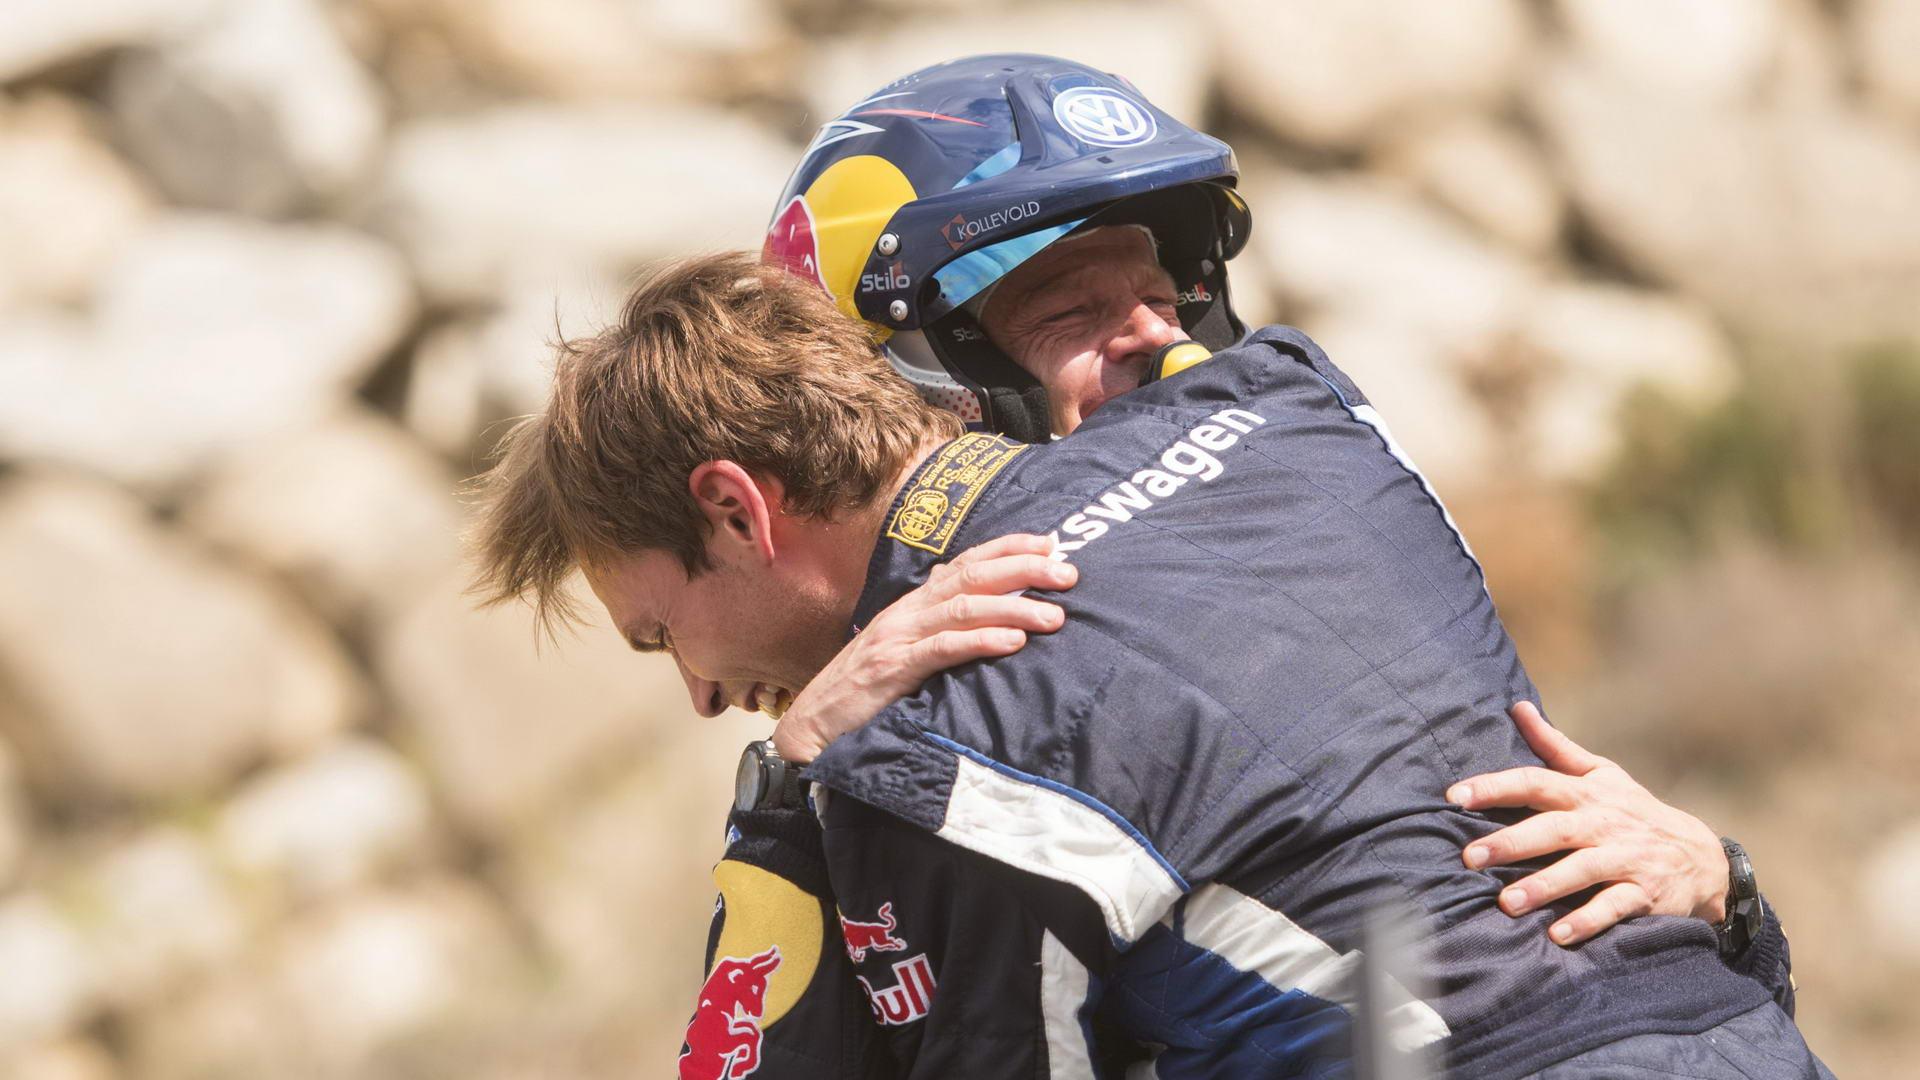 WRC - Closest Asphalt Finish - Catalunya 2015